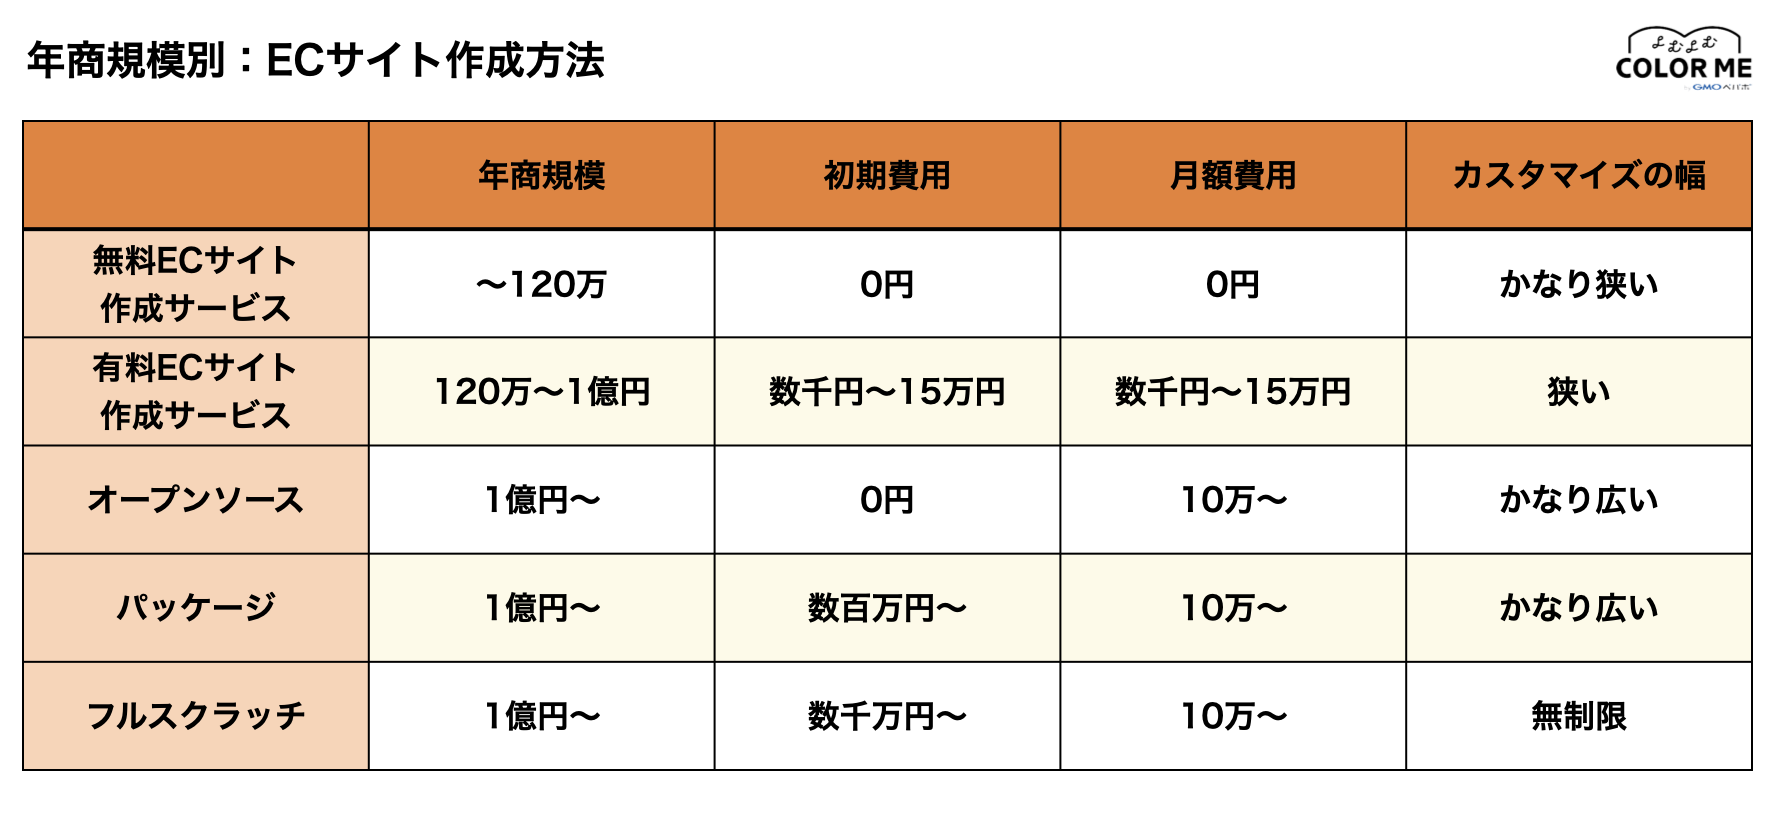 年商規模別:ECサイト作成・構築方法の比較表